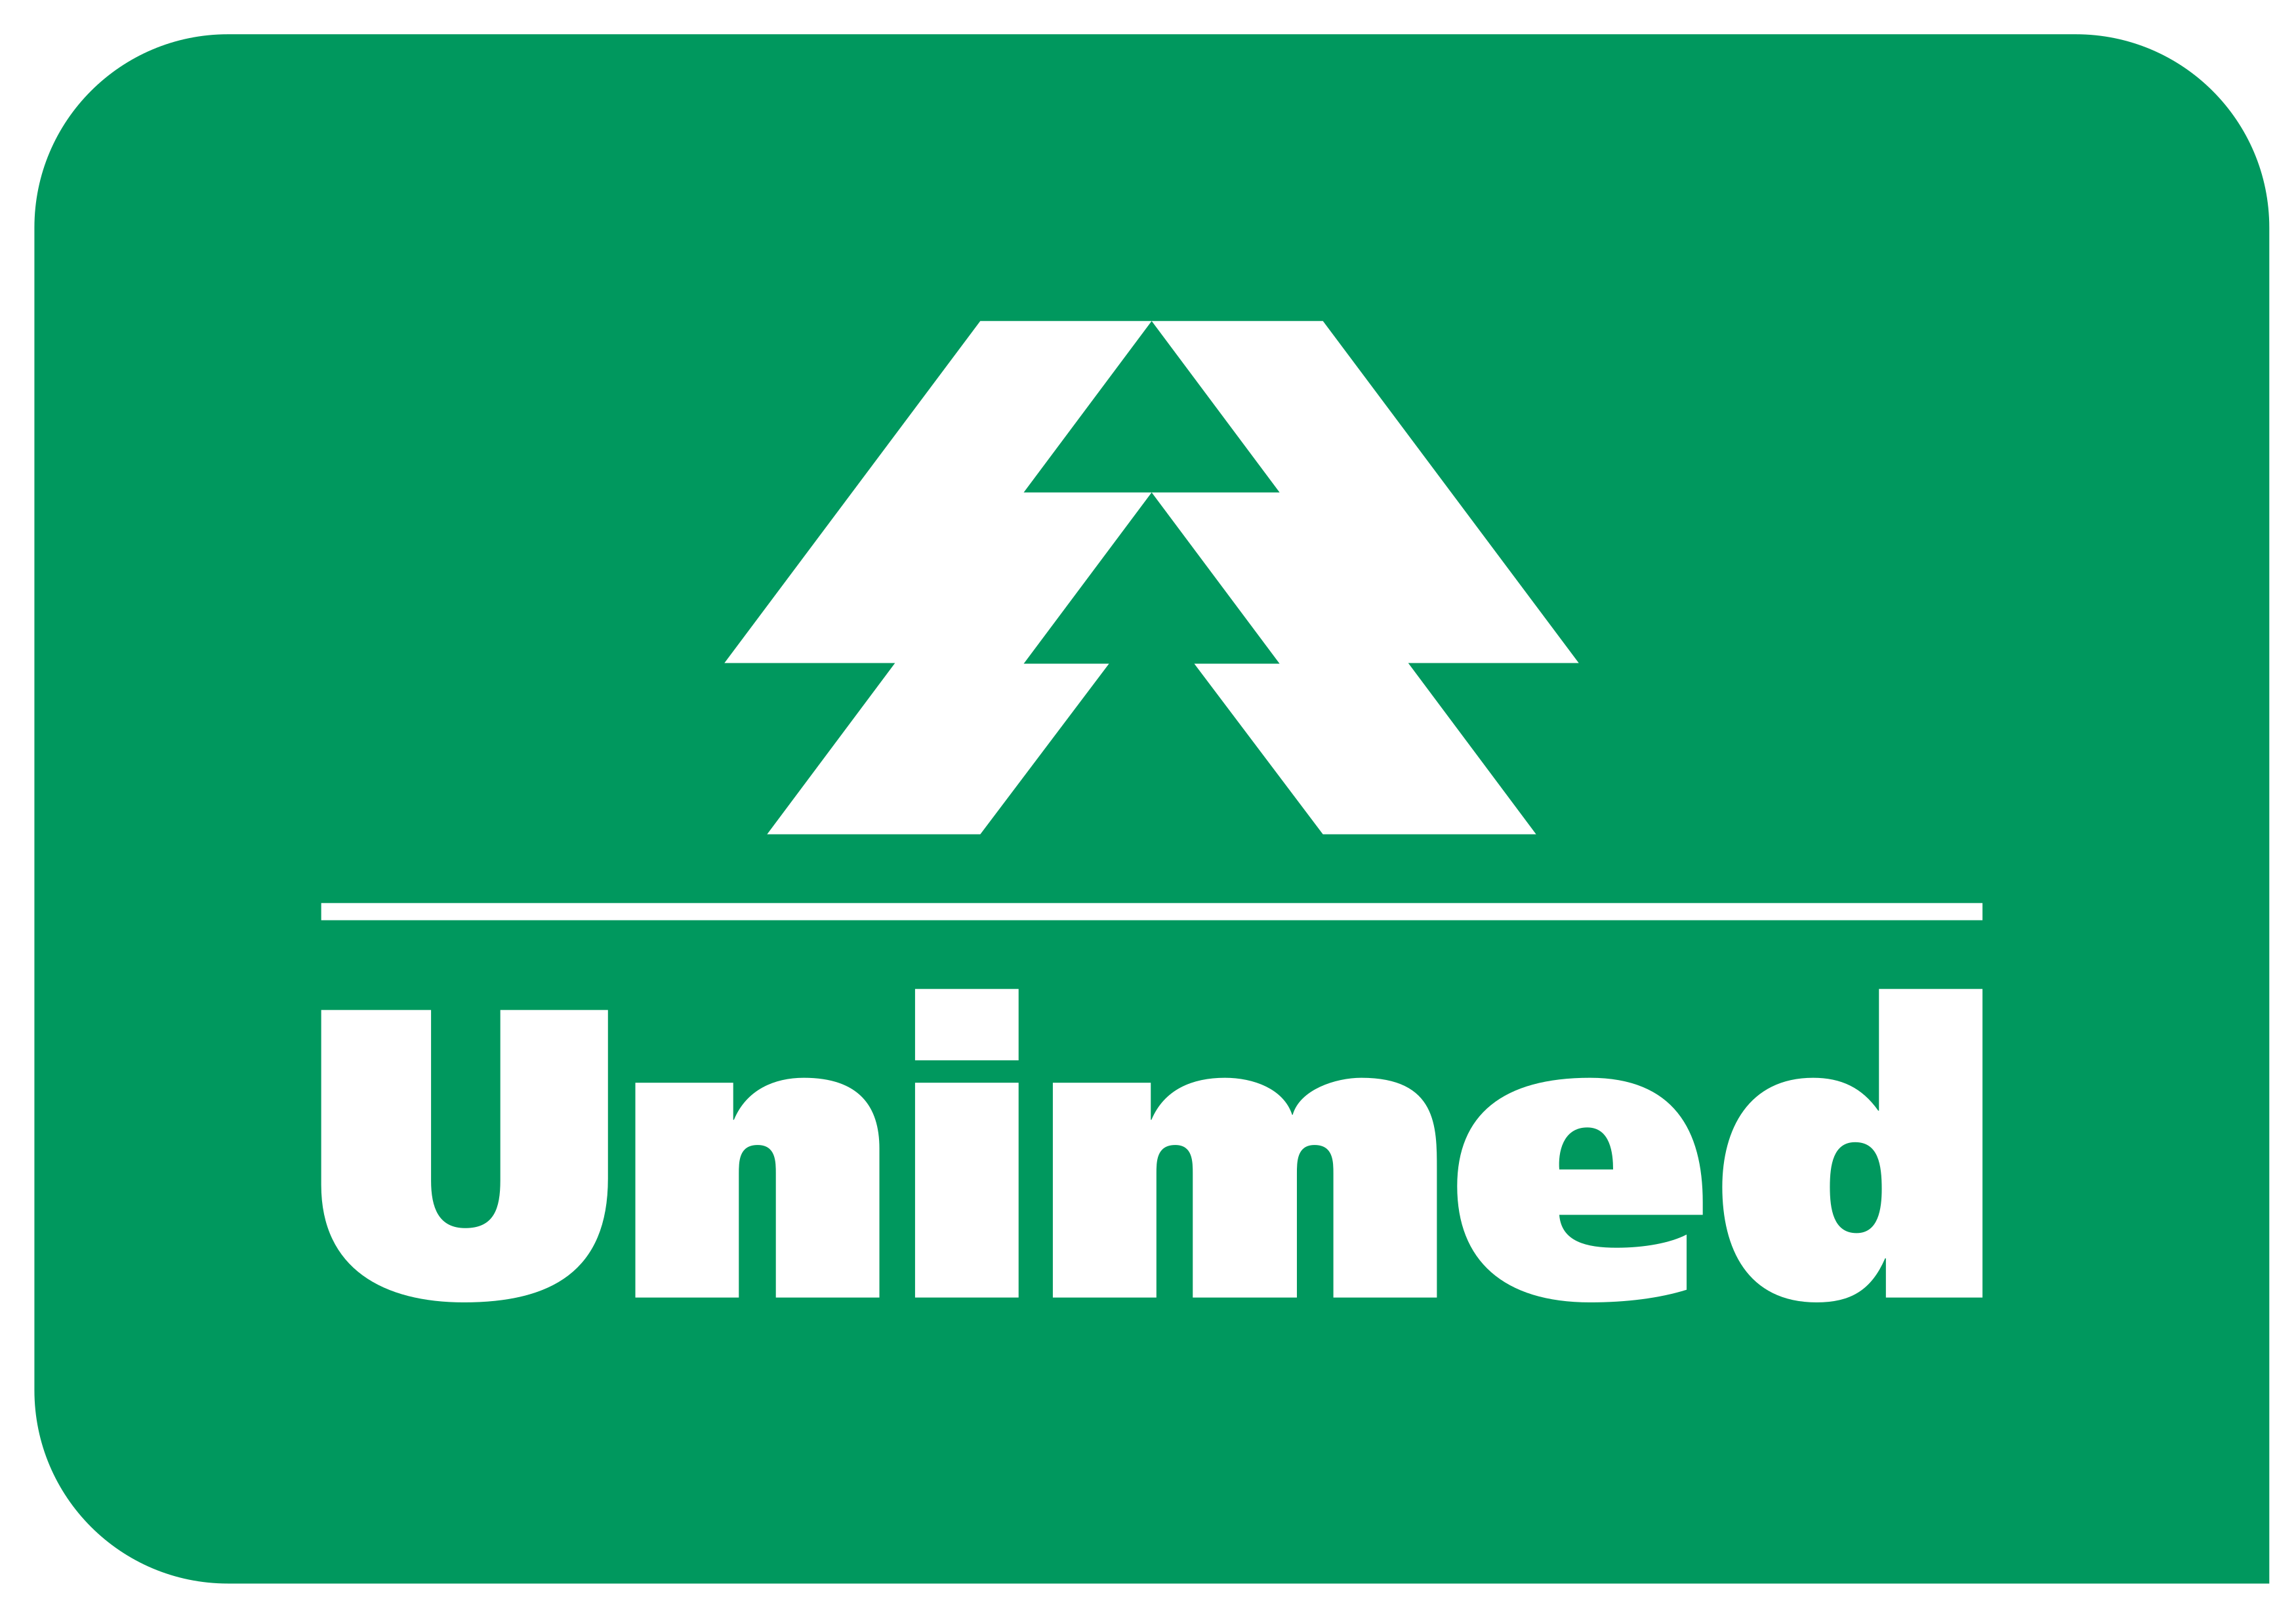 unimed logo 1 2 - Unimed Logo